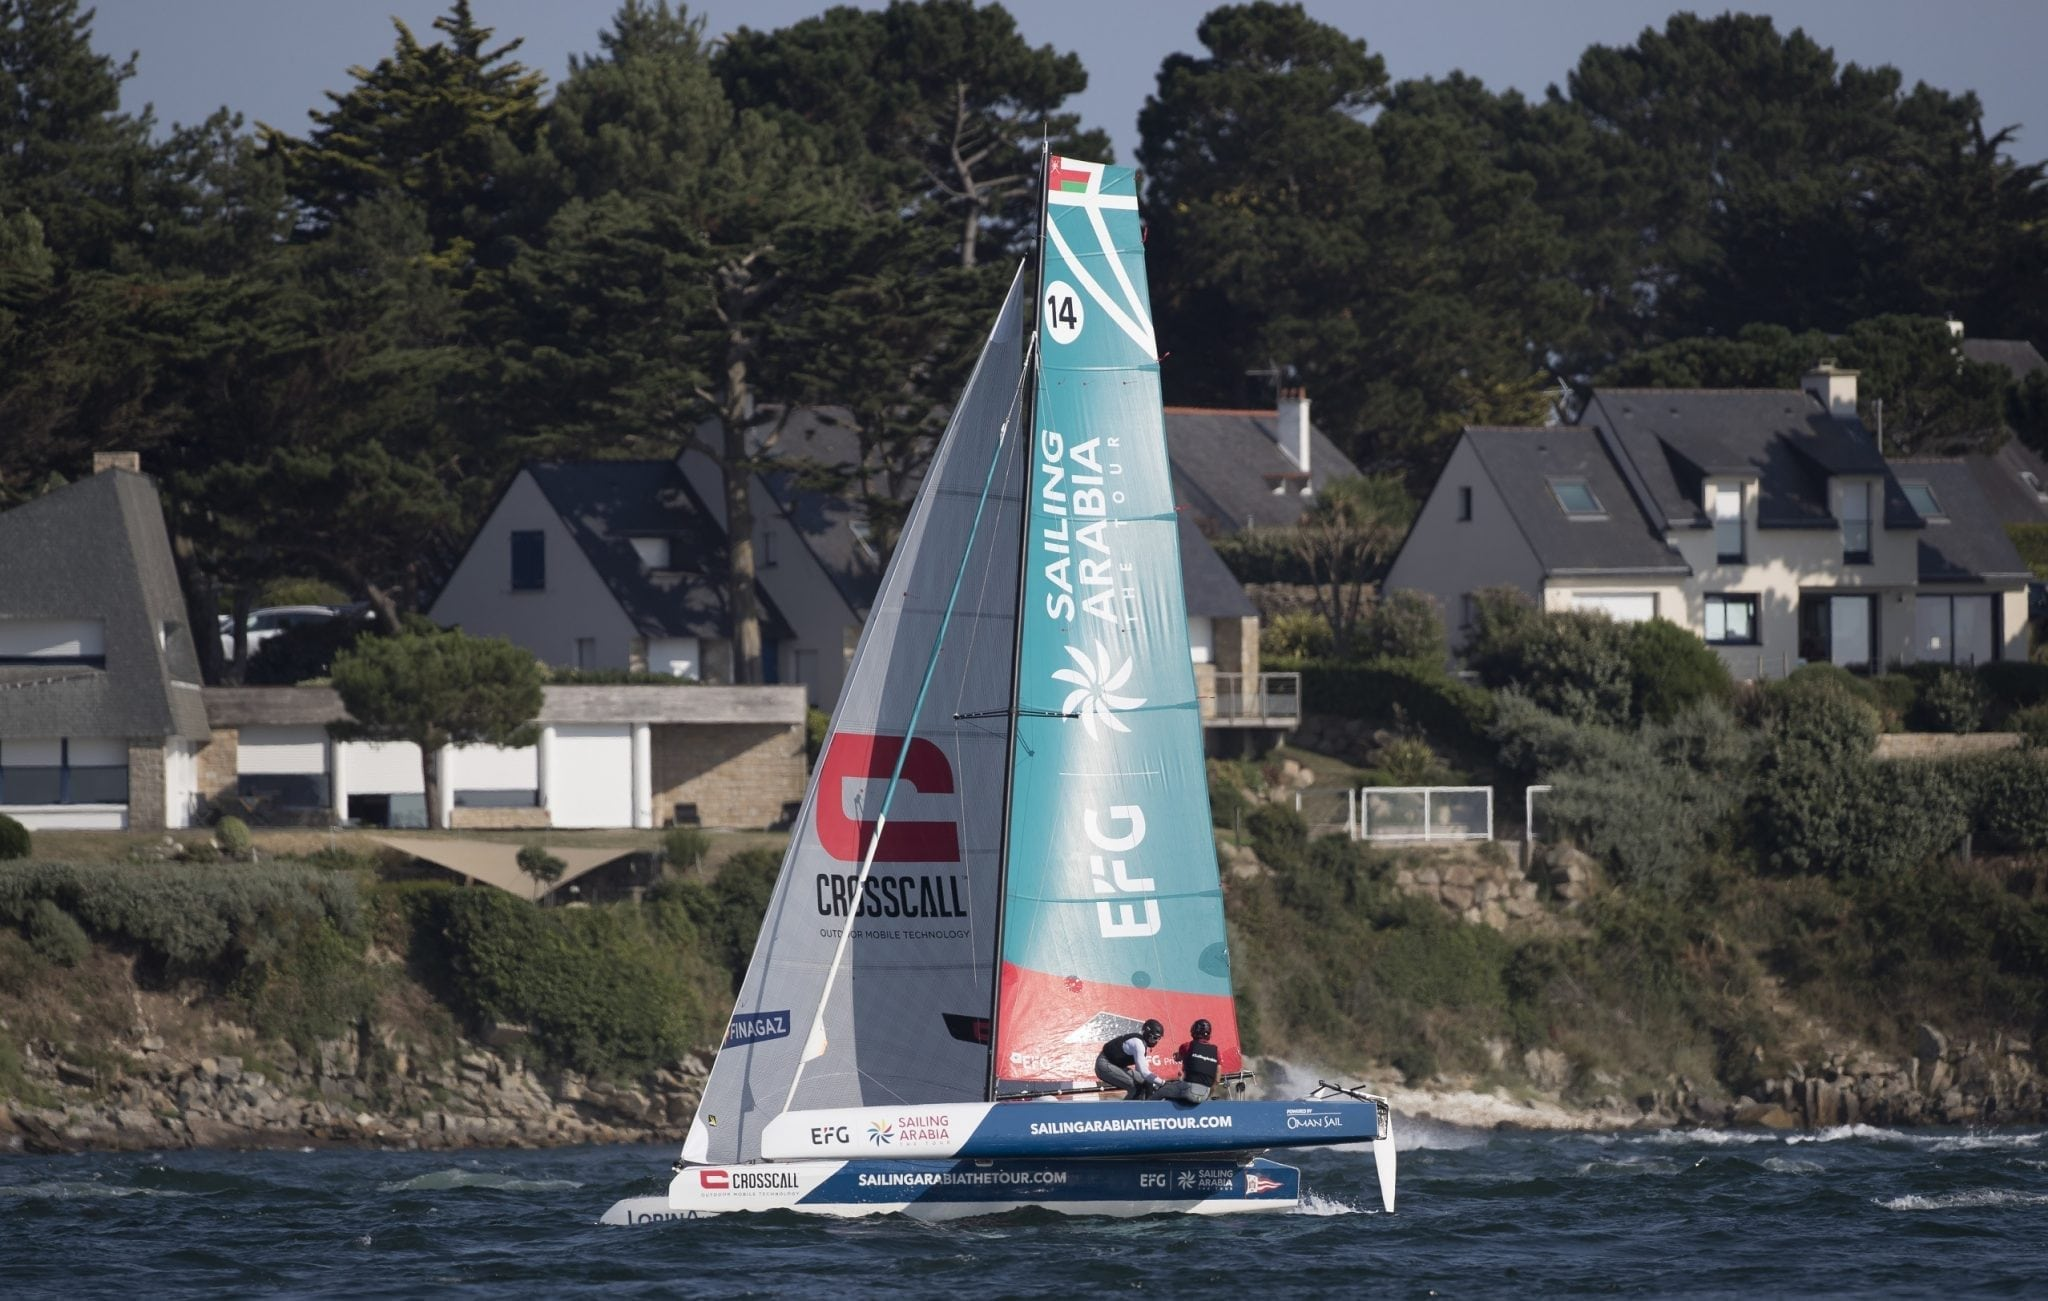 Oman Sail's Diam 24 team overcome adversity to keep Tour Voile podium goal in reach